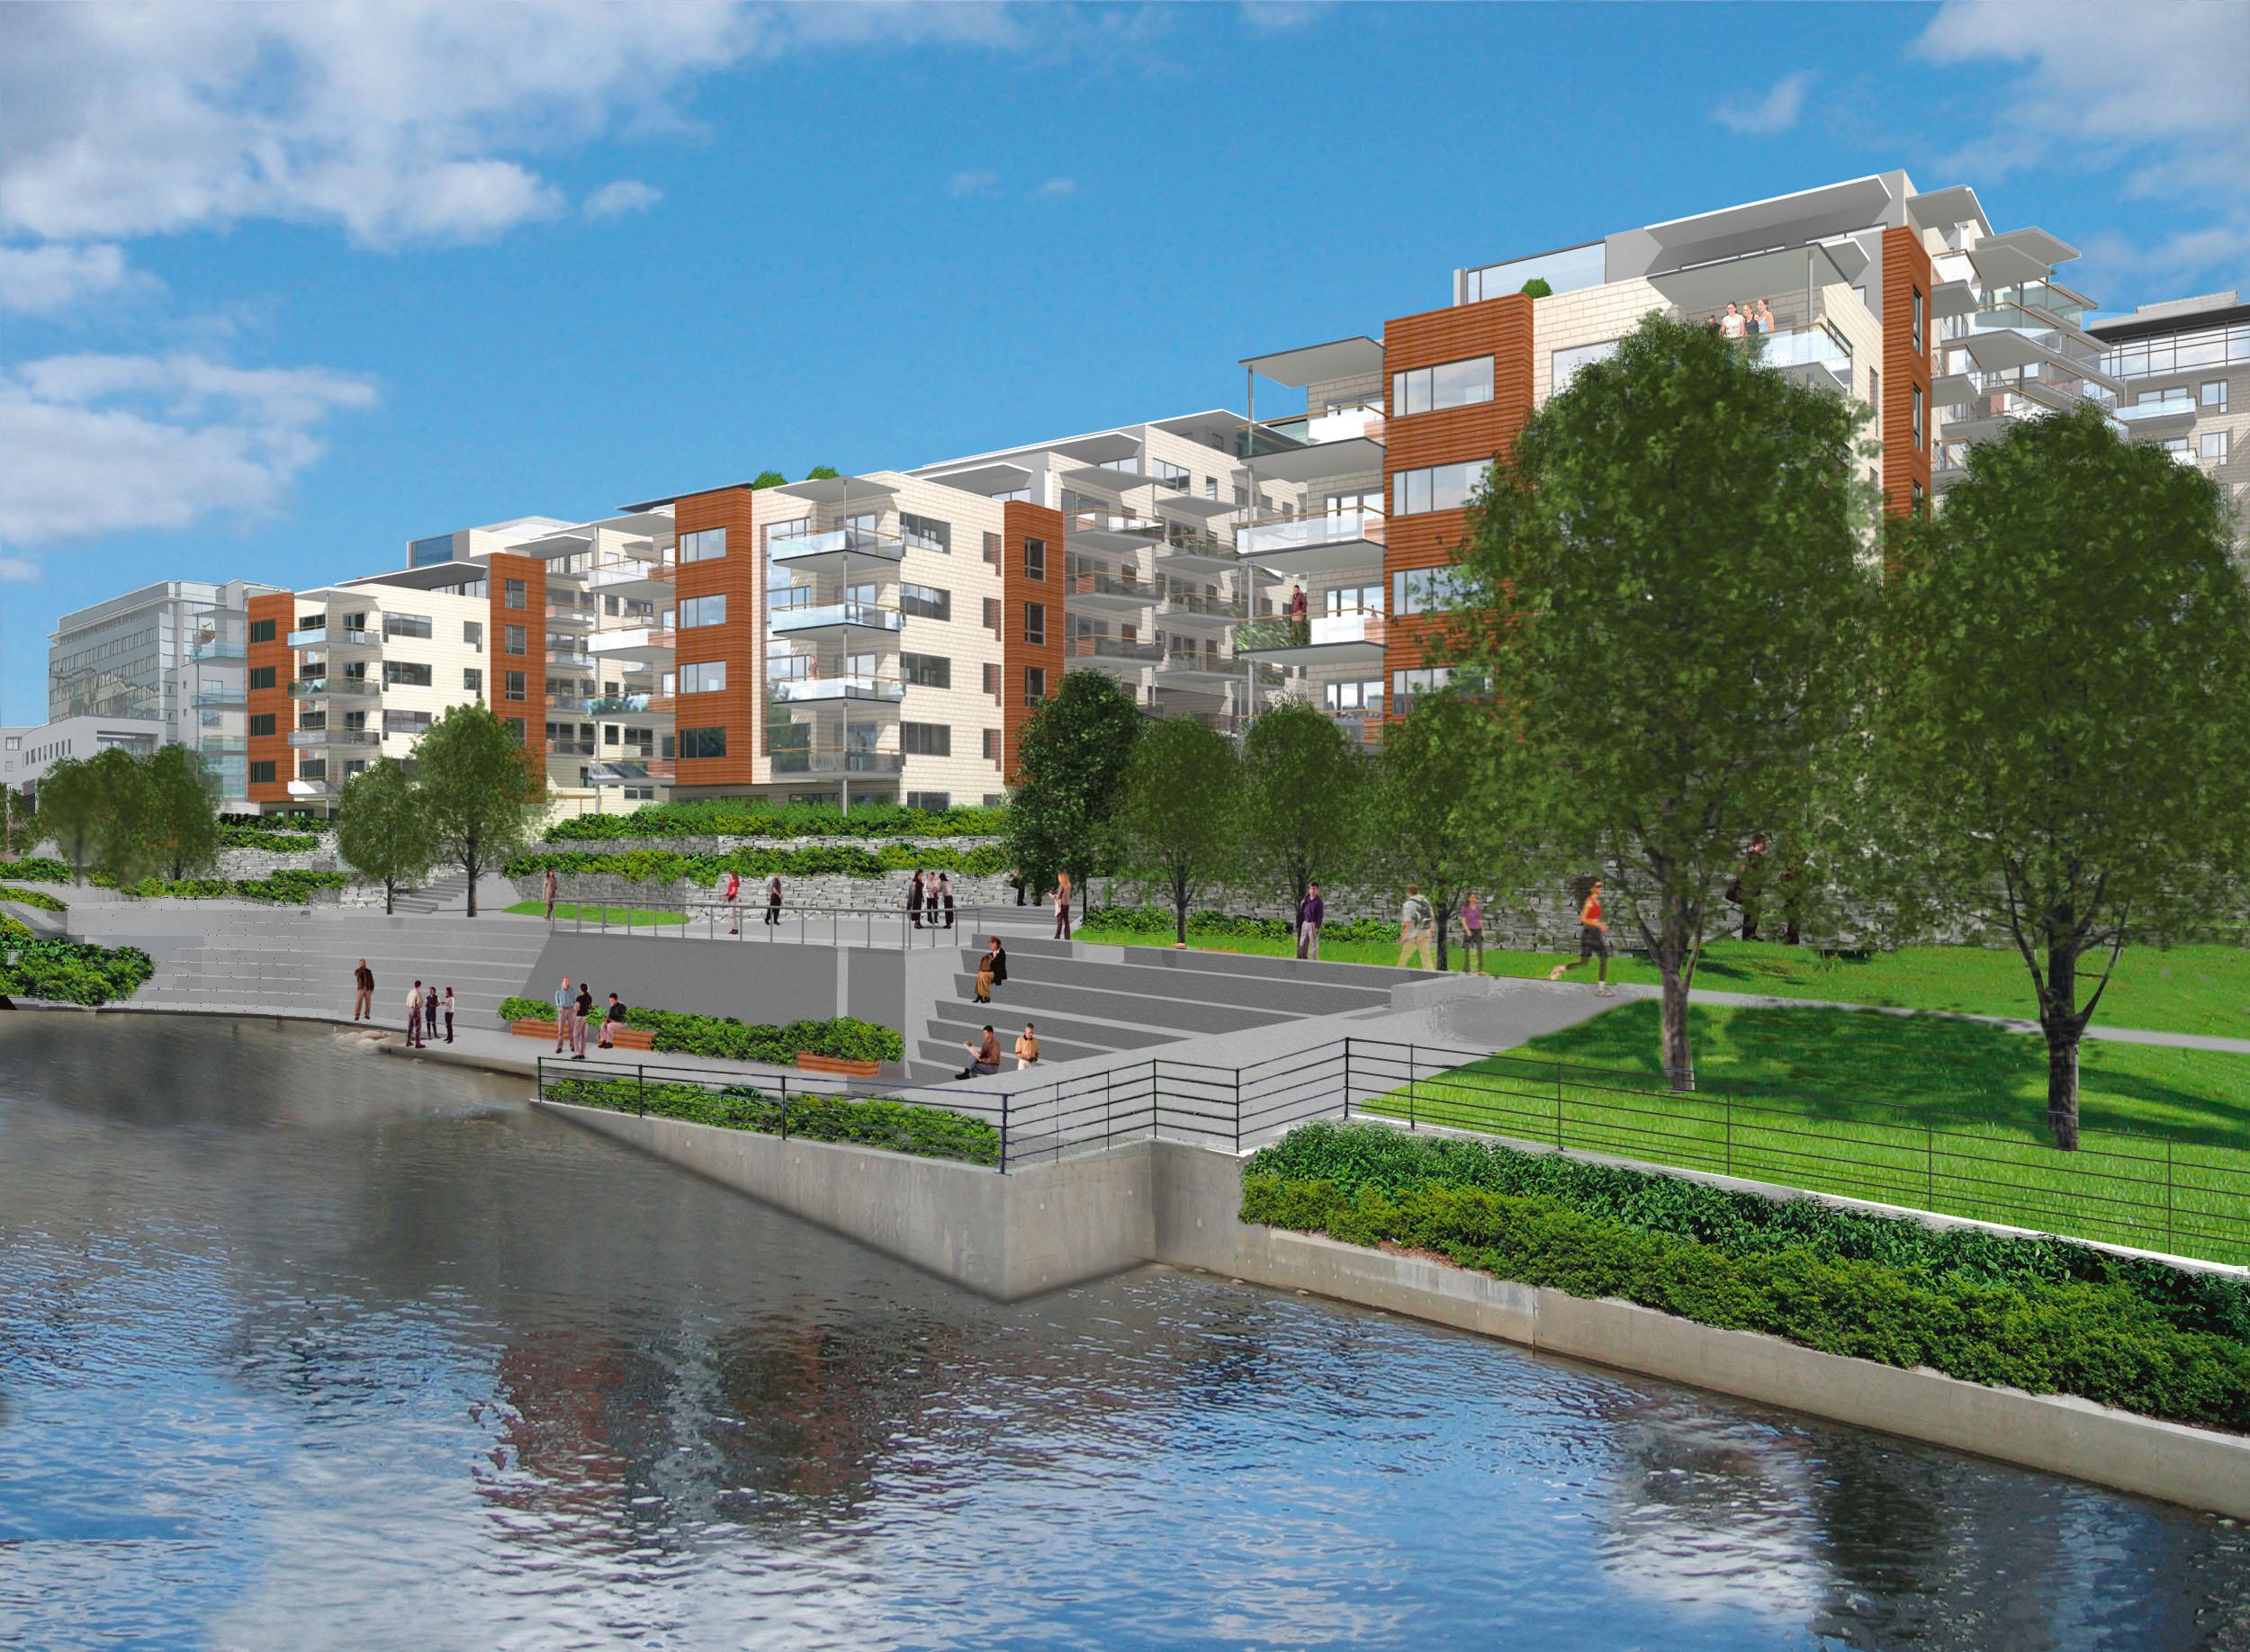 Solsiden boligprosjekt, Nydalen